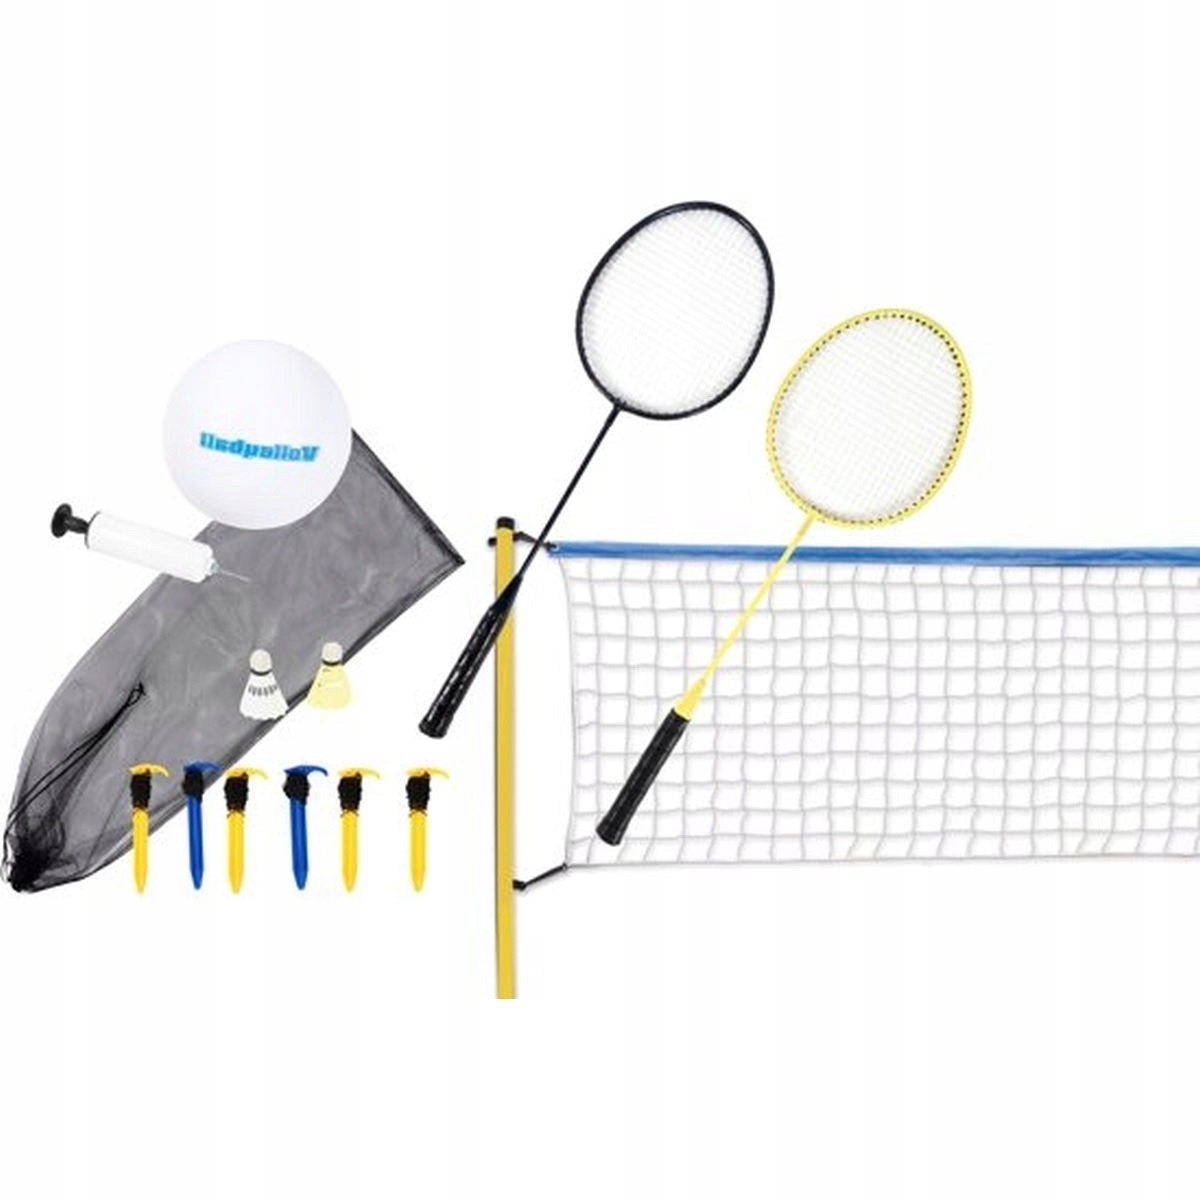 2in1 волейбол и бадминтон сетка для мяча